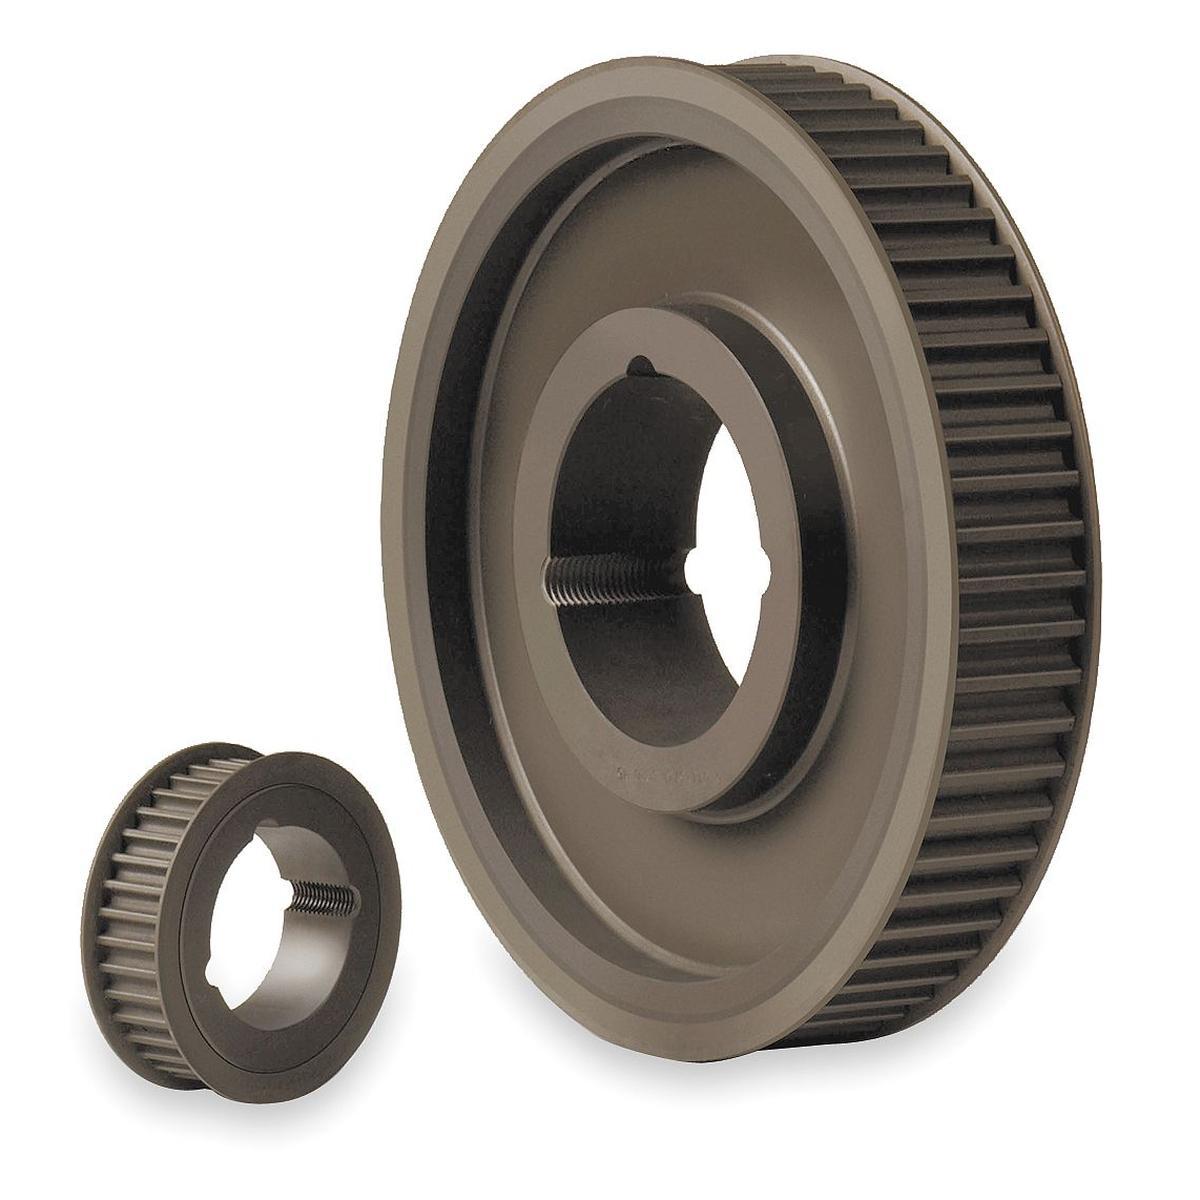 Timing Belt 4808m30 Industry Neoprene Gamut Pitch Diameter